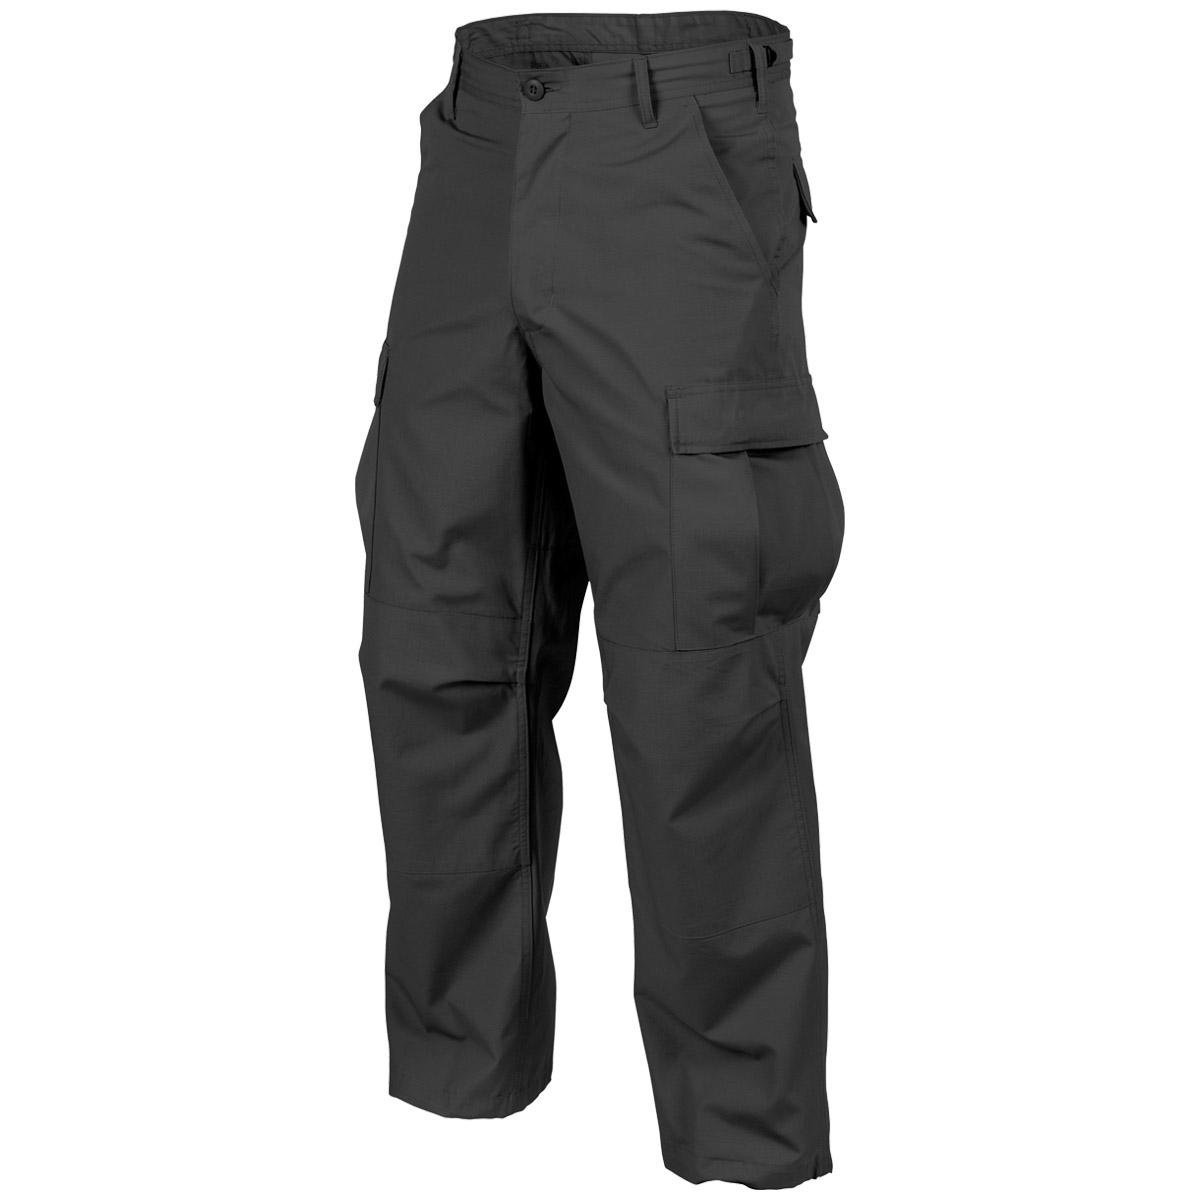 black tactical cargo pants - photo #2